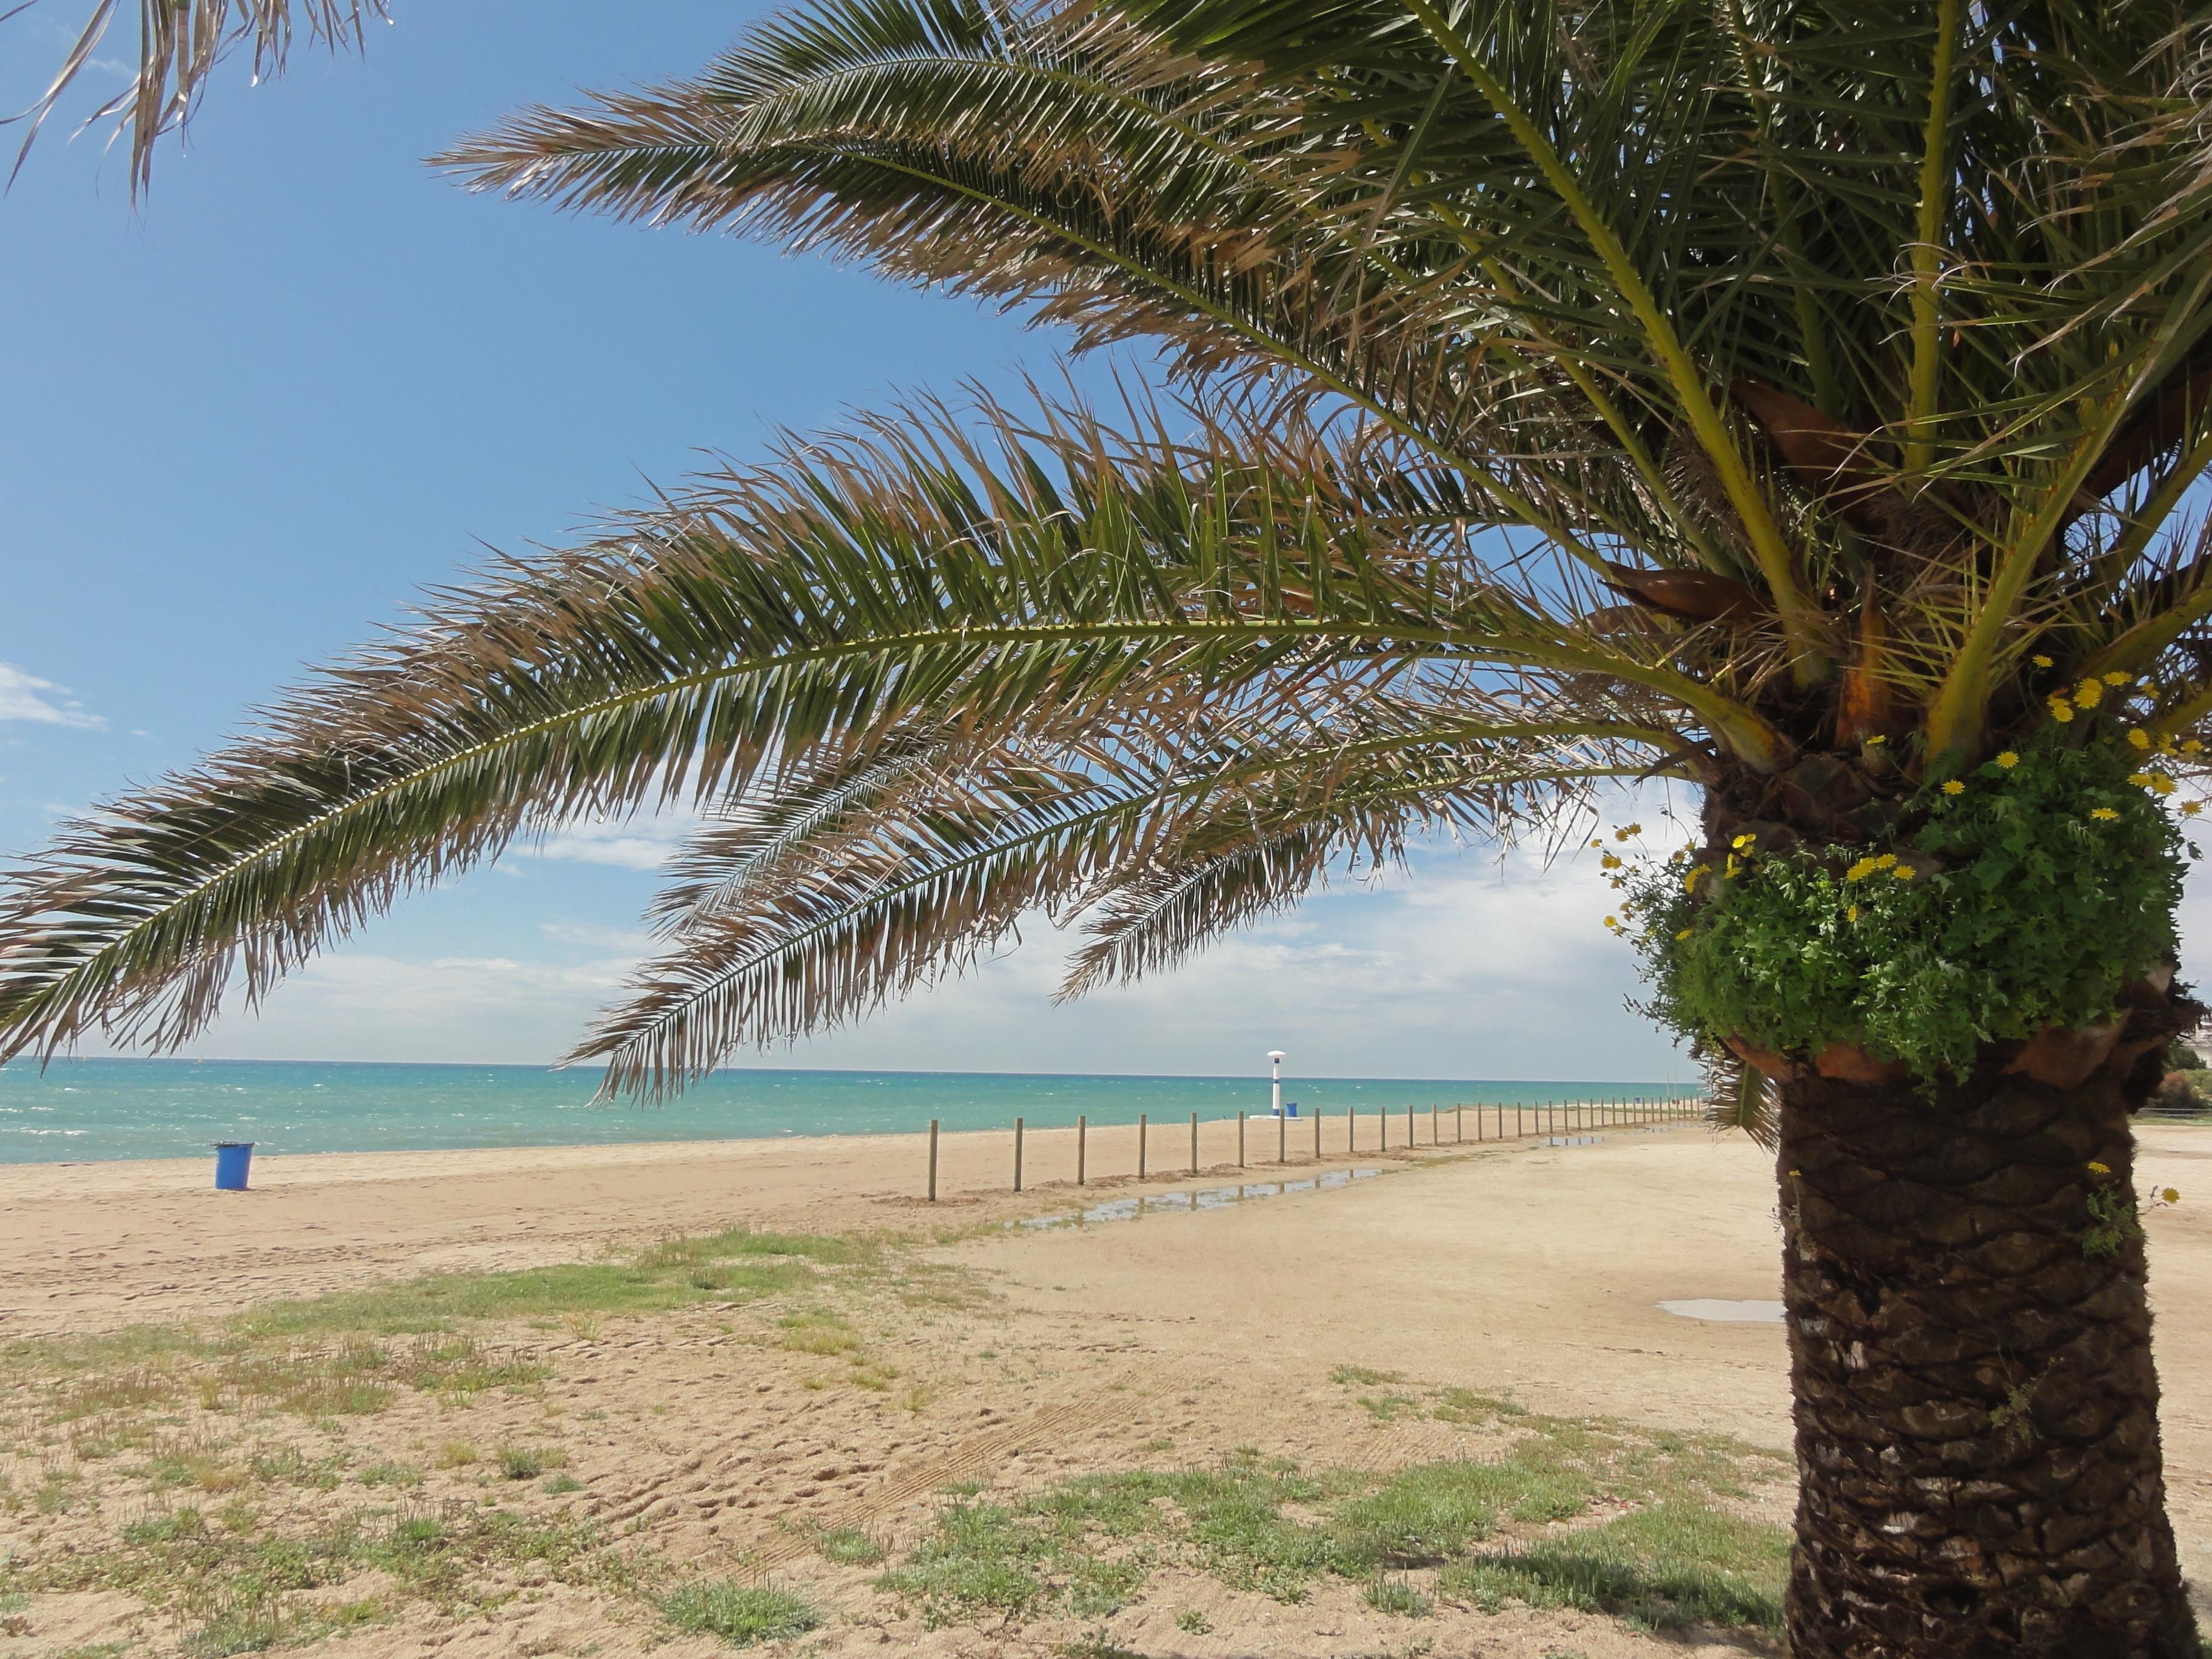 Pineda de Mar Beach, Pineda de Mar, Catalonia, Spain